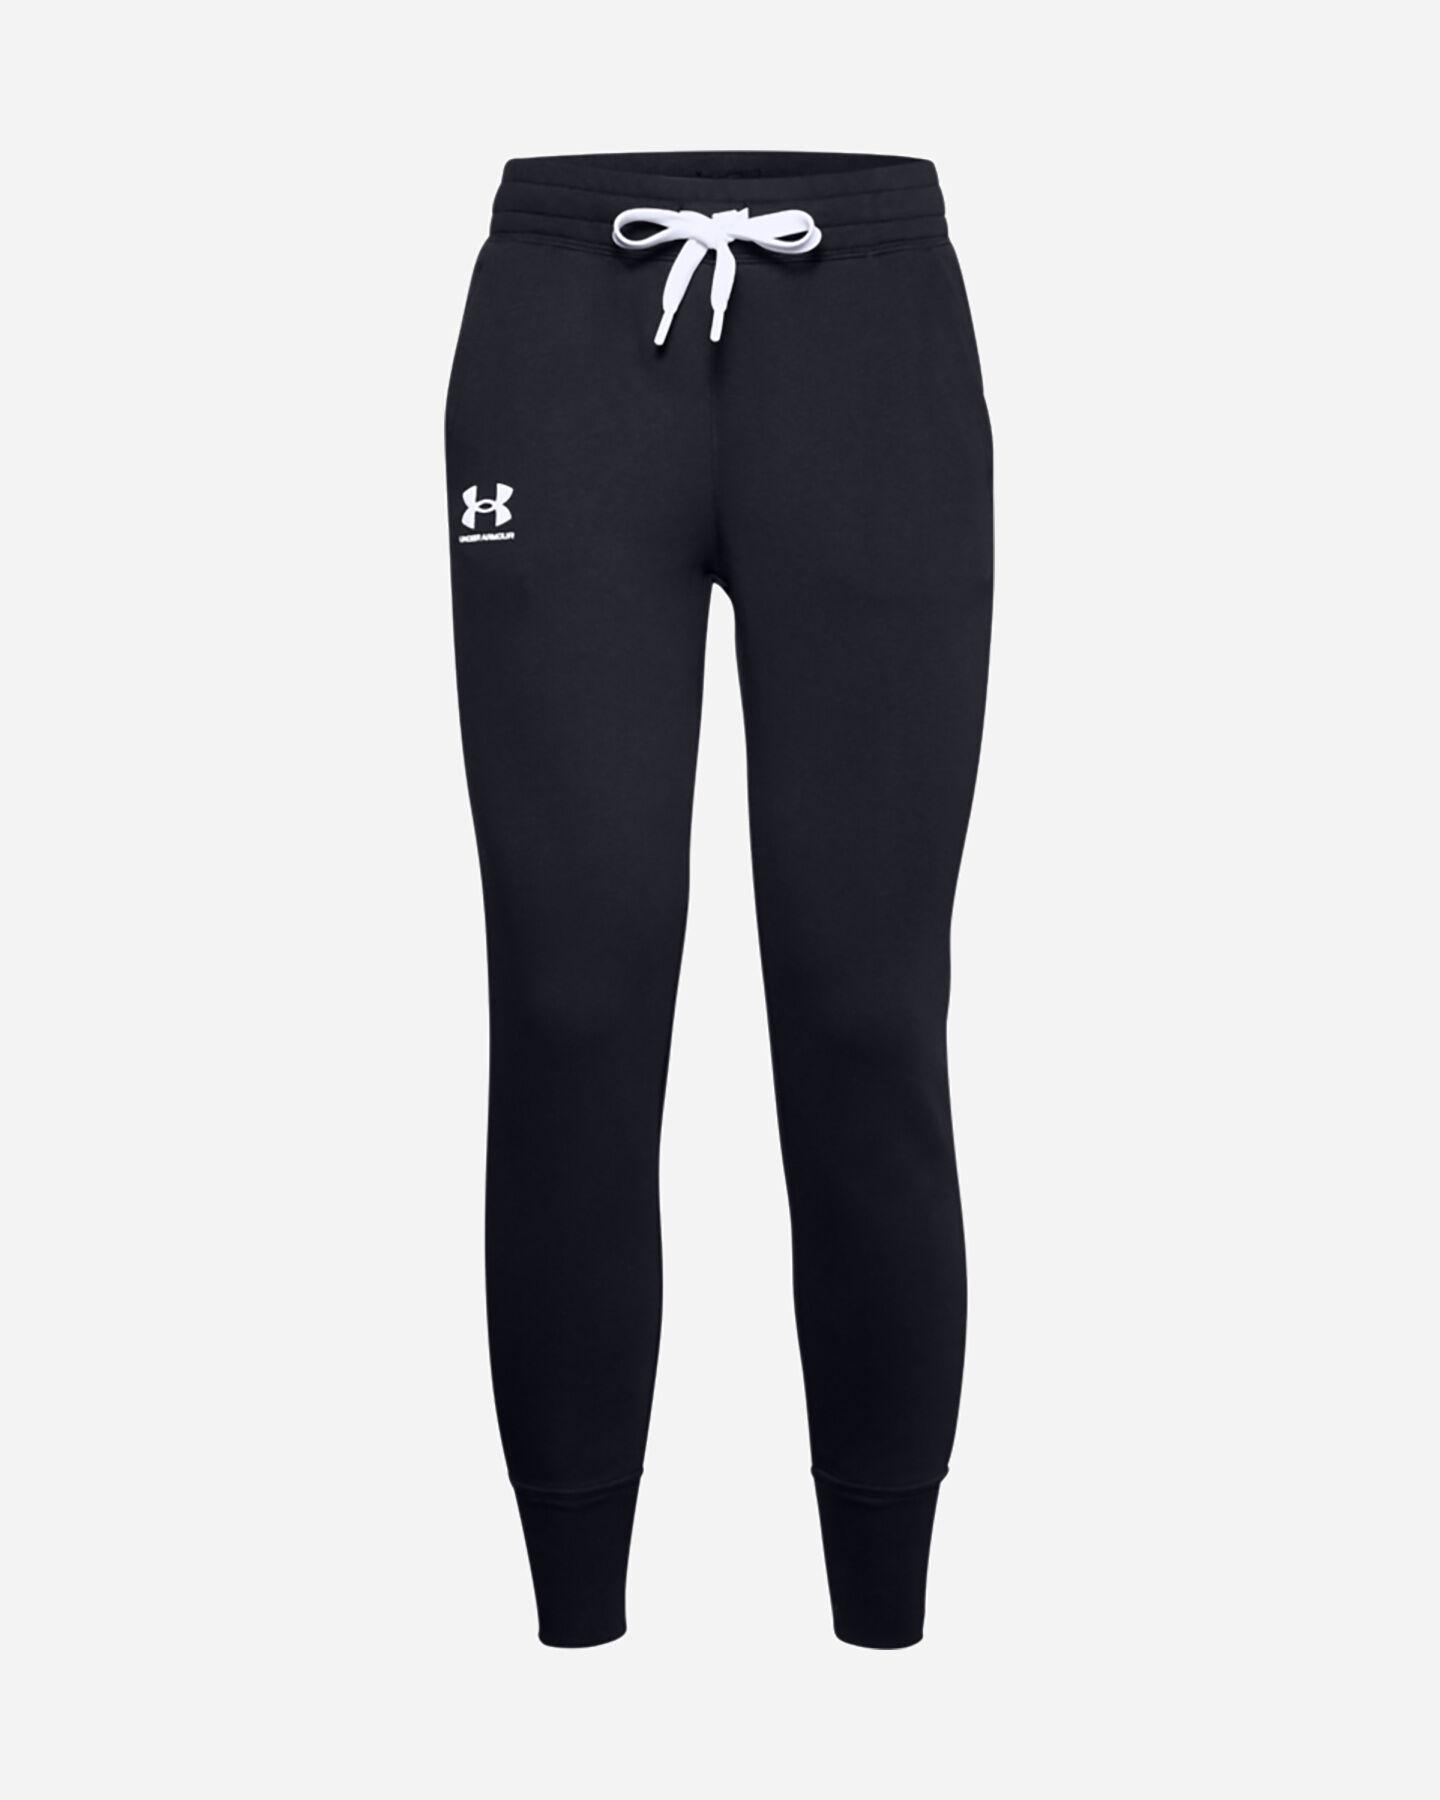 Pantalone UNDER ARMOUR RIVAL FLEECE W S5229266 scatto 0